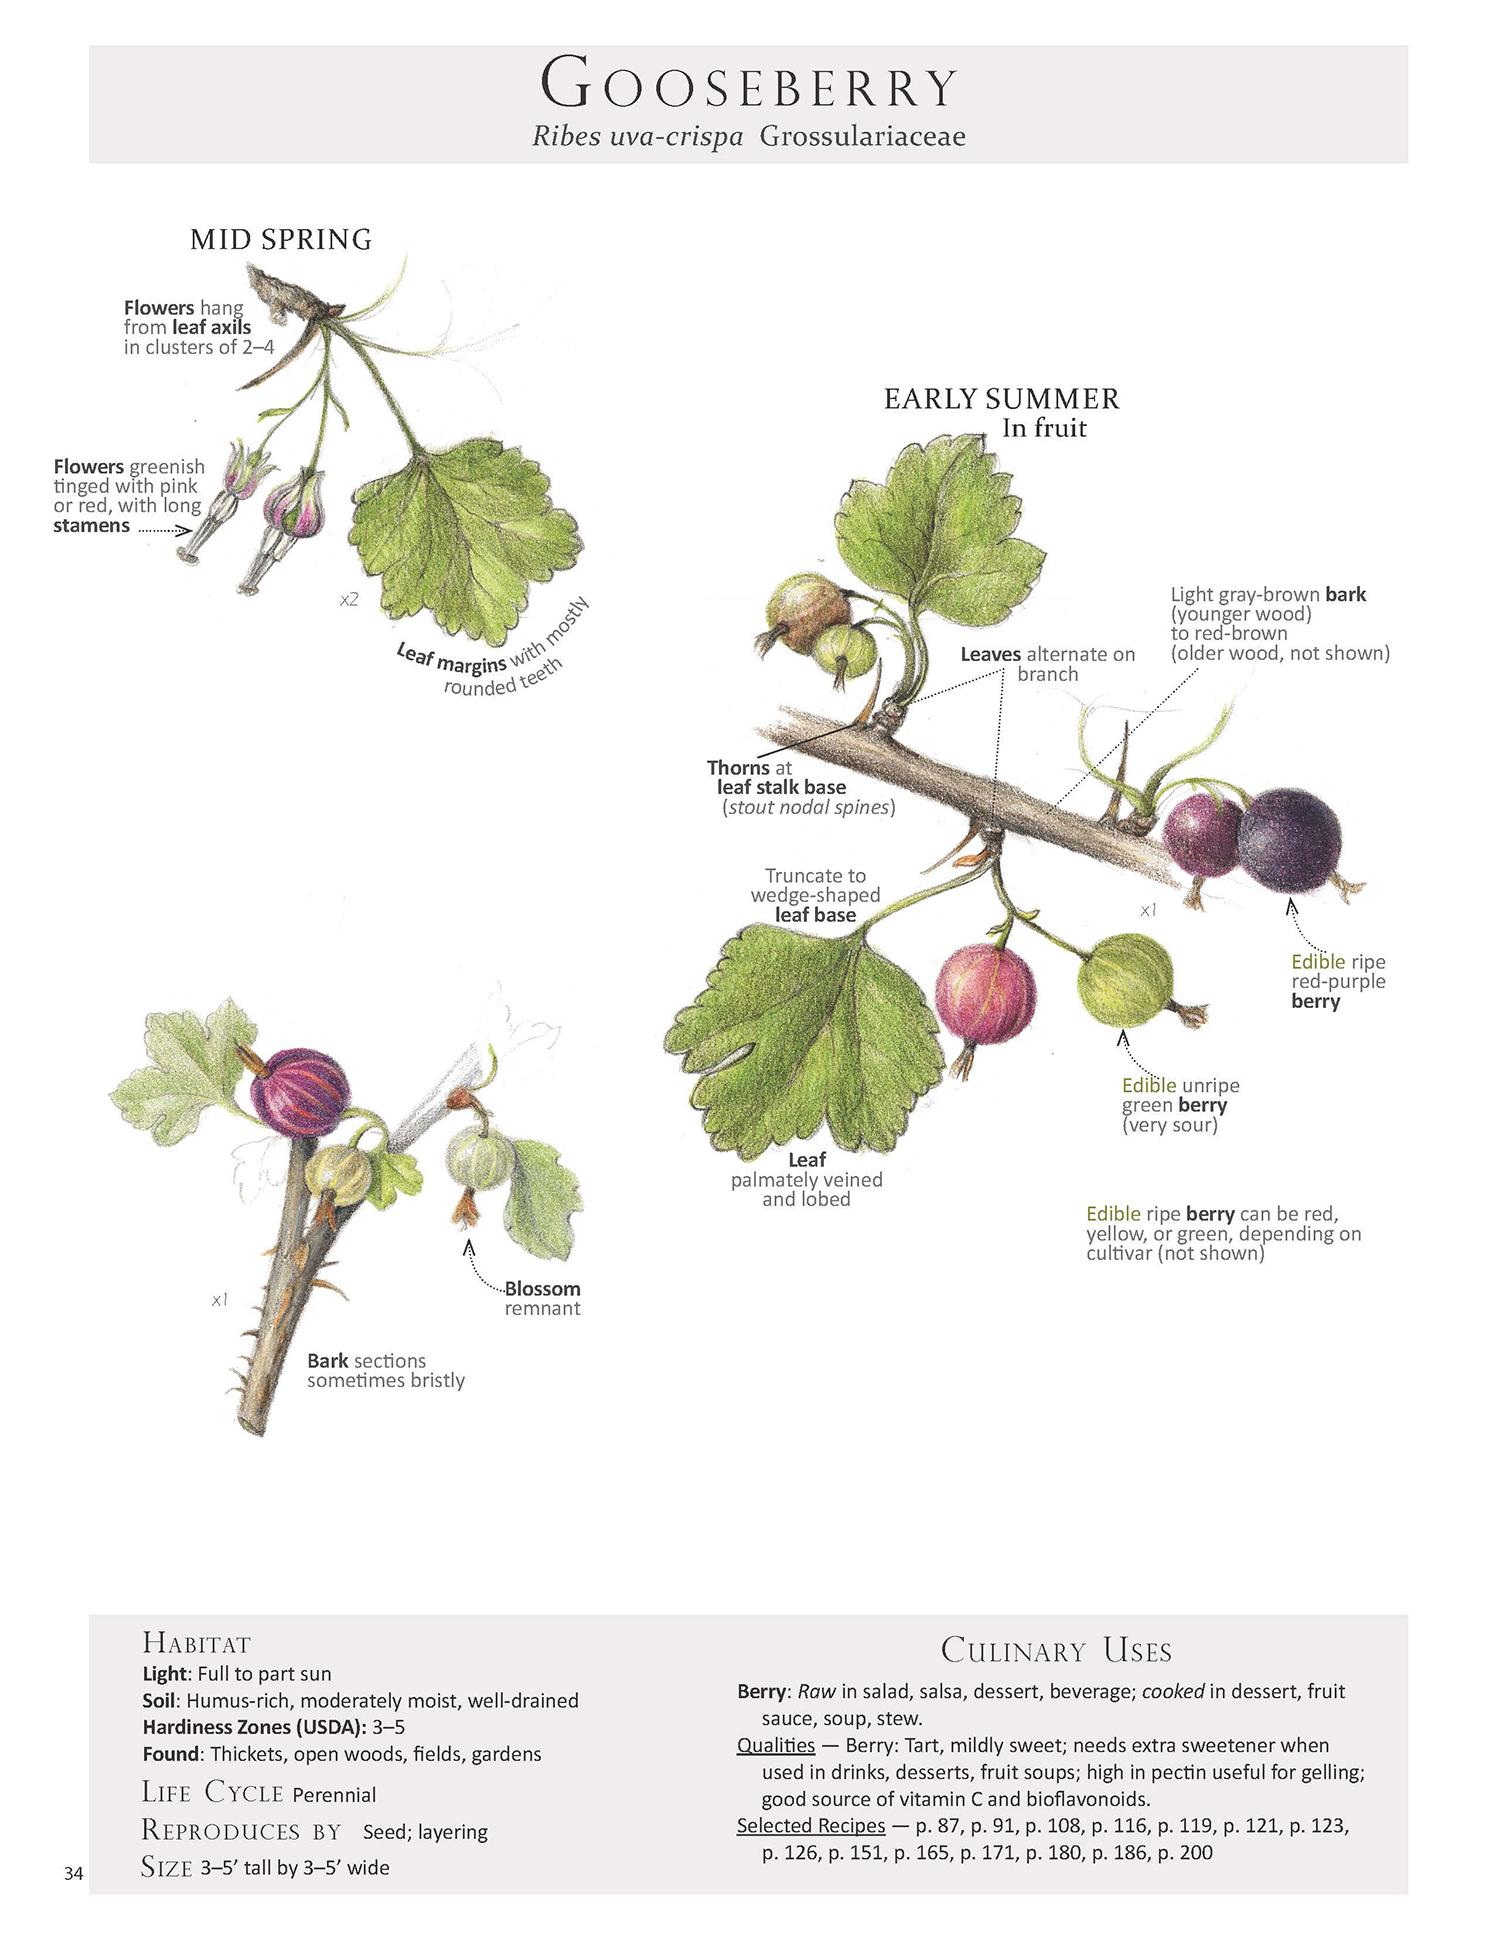 Gooseberry - Ribes uva-crispa